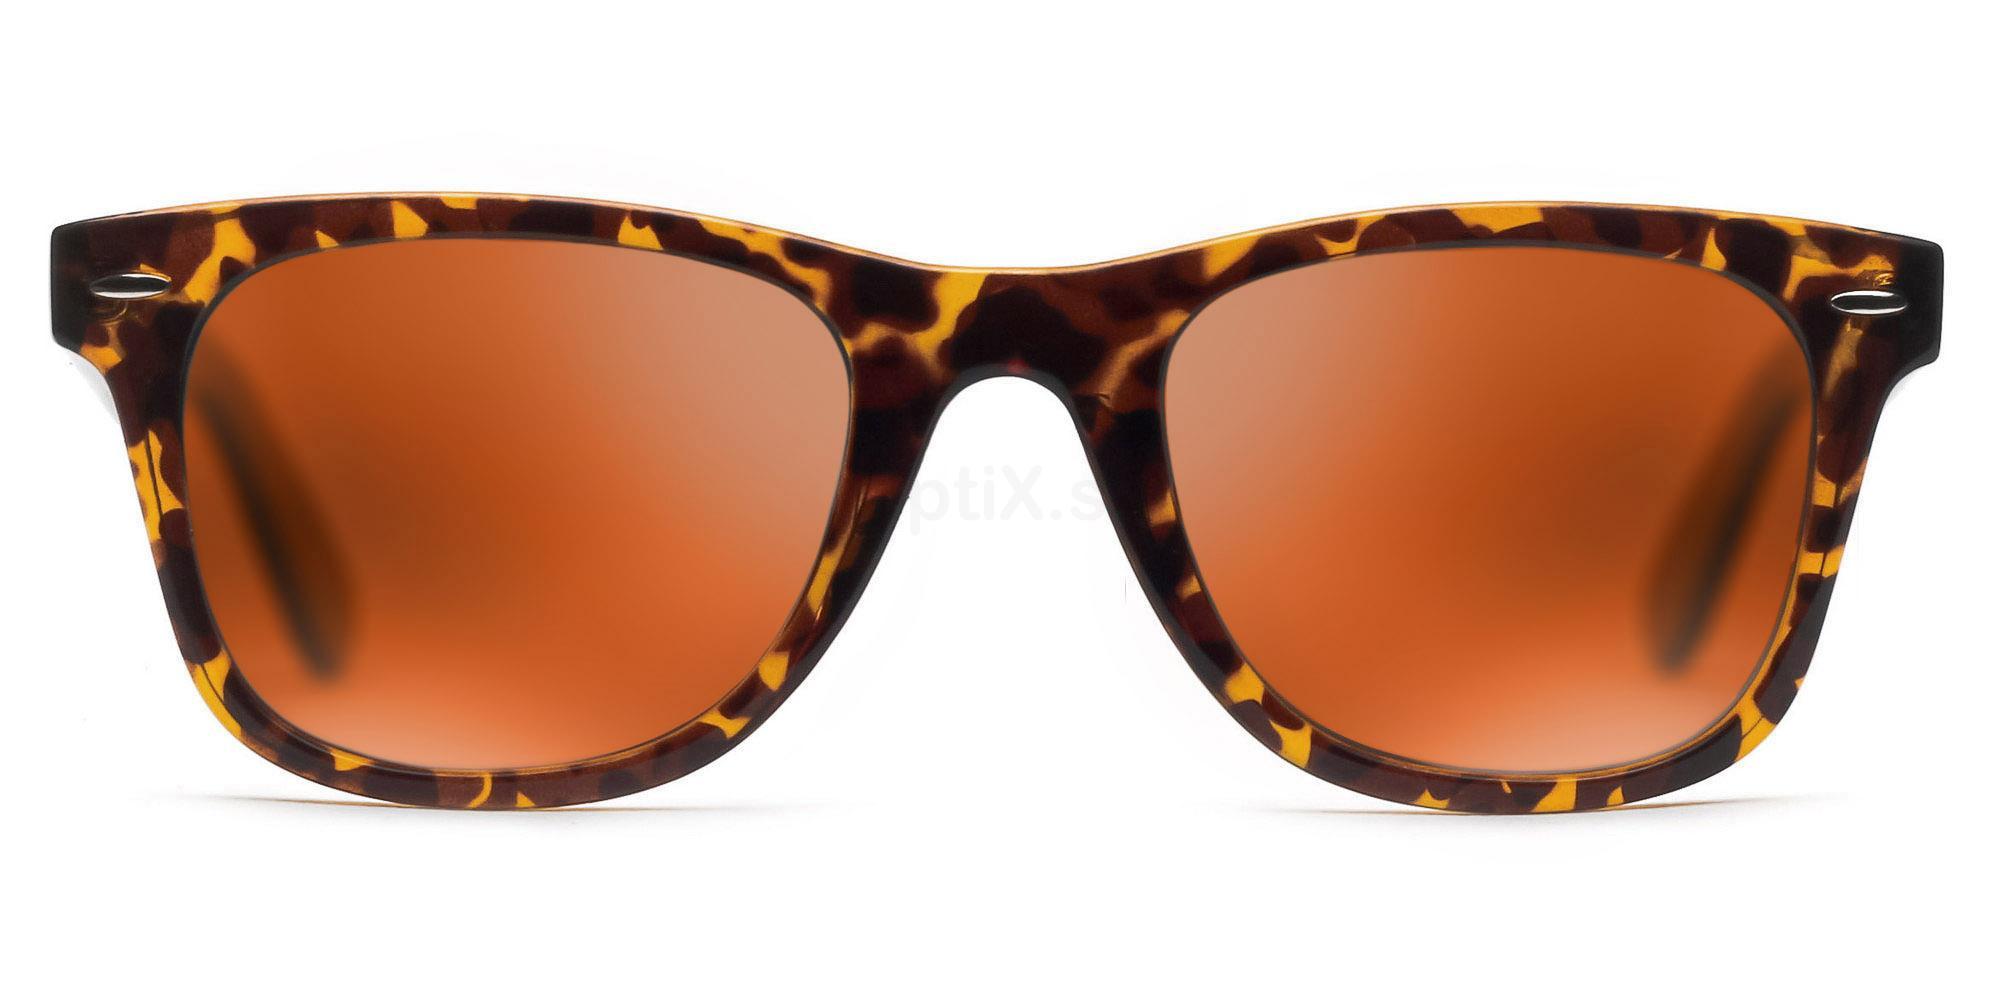 C04 Polarized Grey with Orange Mirror P2429 - Havana (Mirrored Polarized) , Savannah